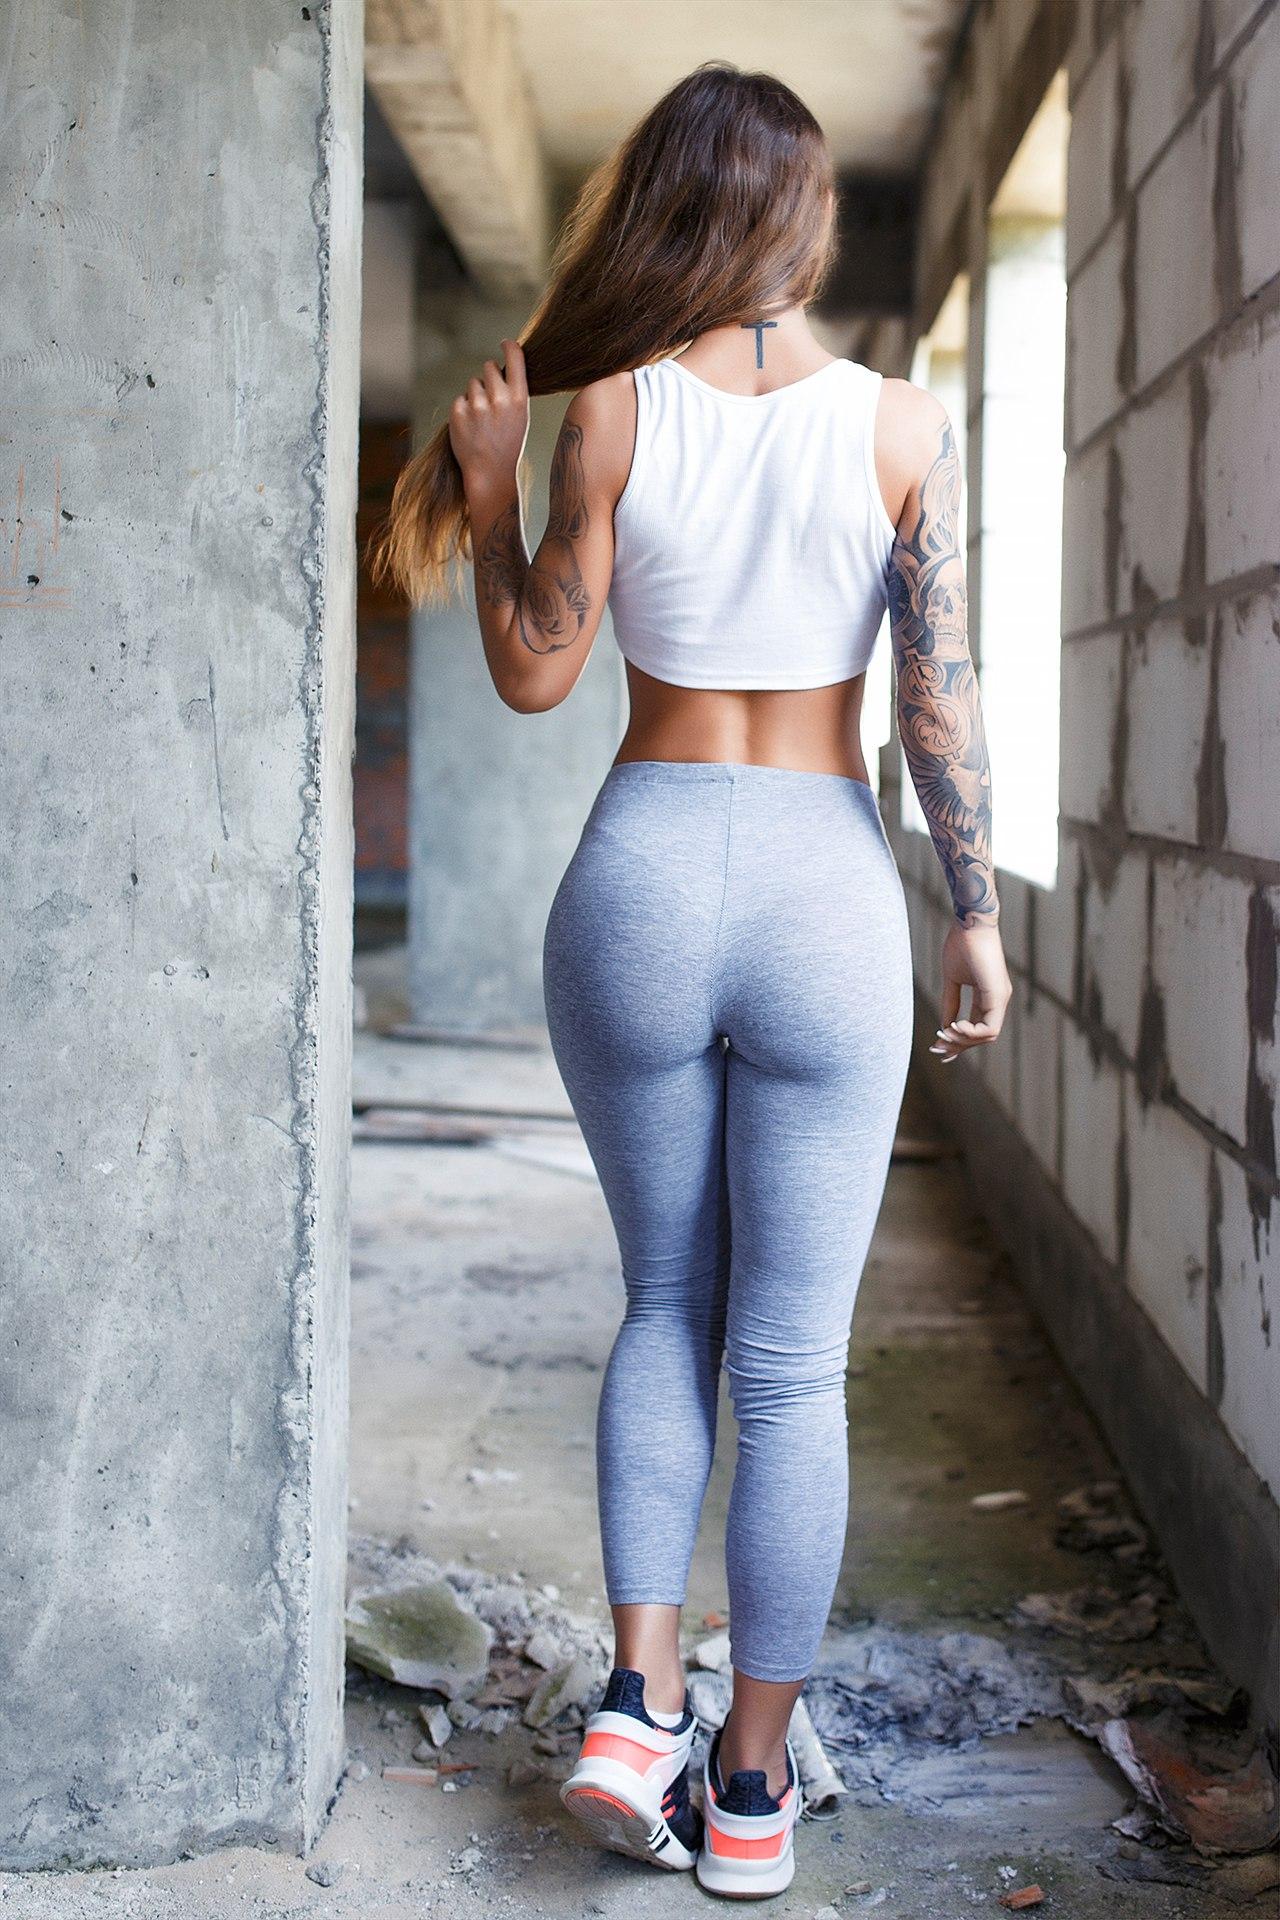 Diana Adamia